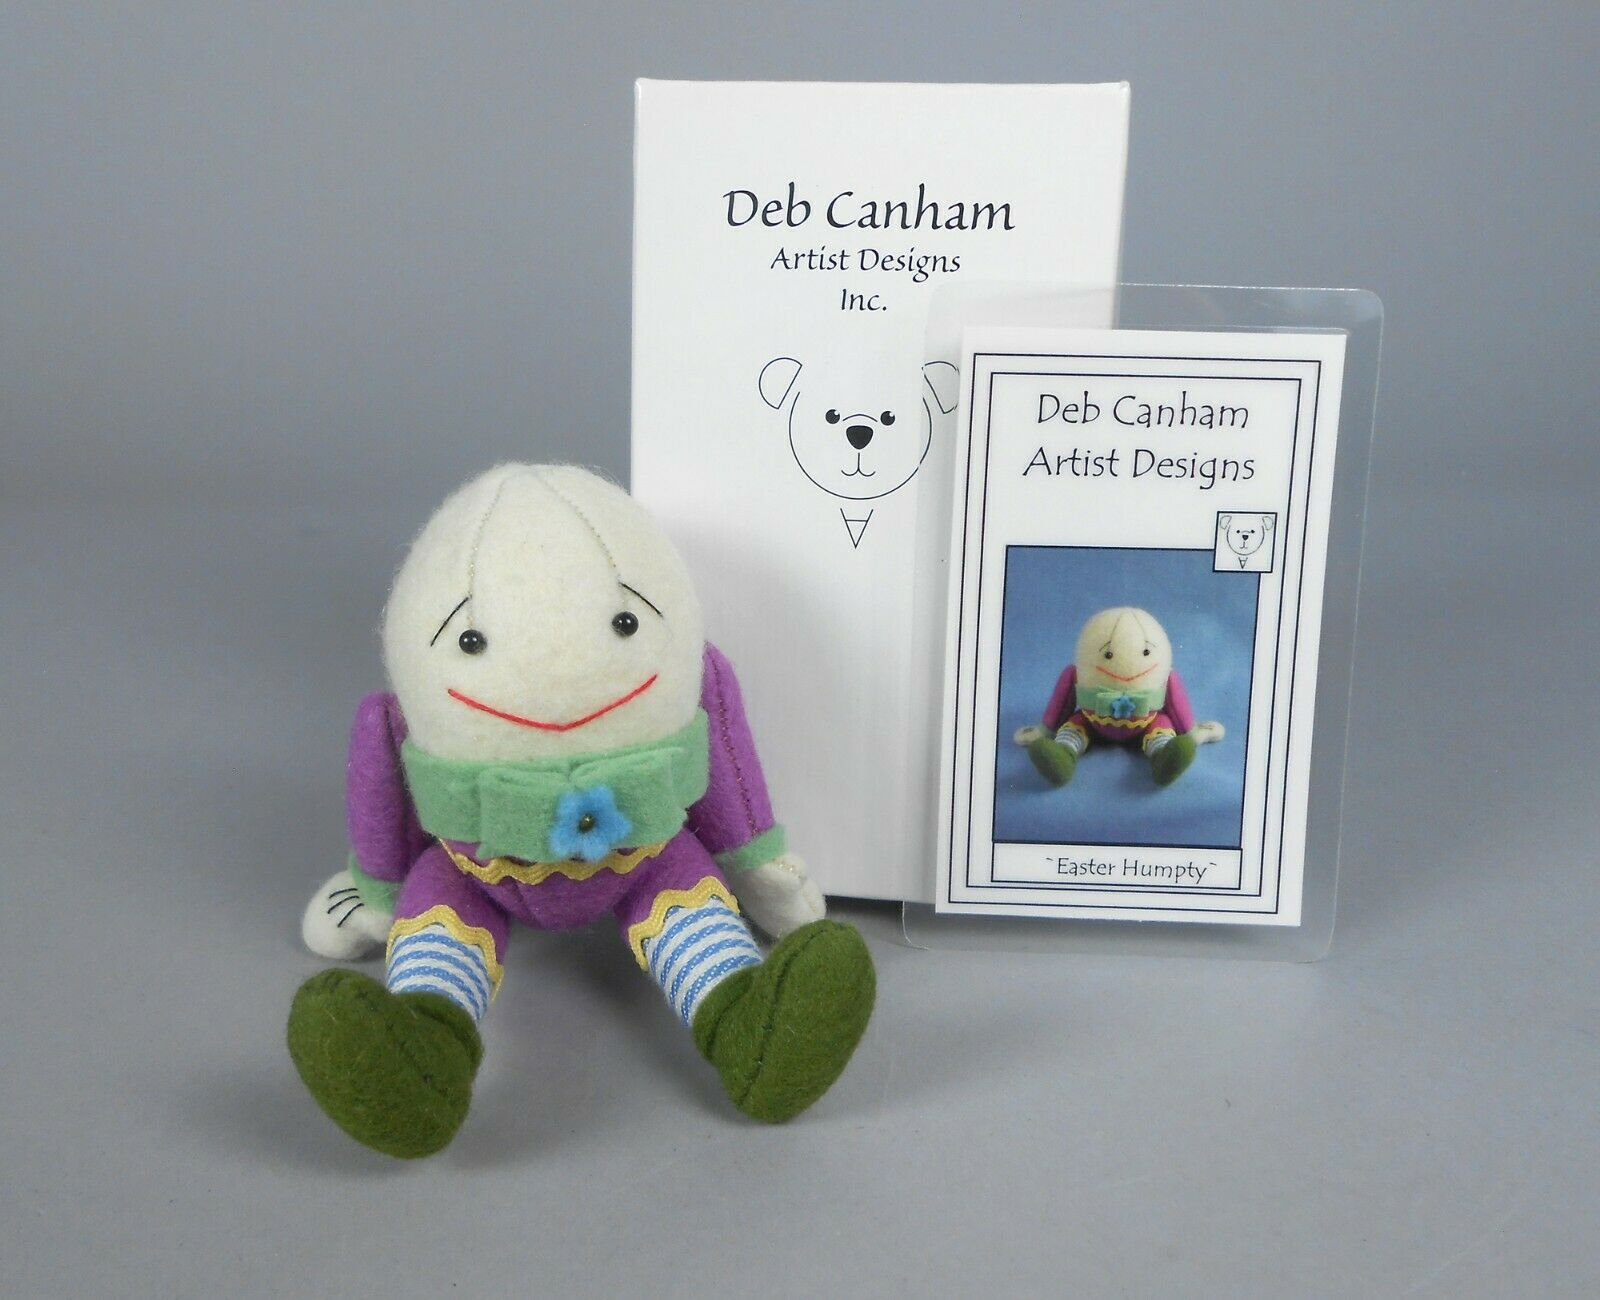 как выглядит Deb Canham Easter Humpty Dumpty Miniature Animal фото